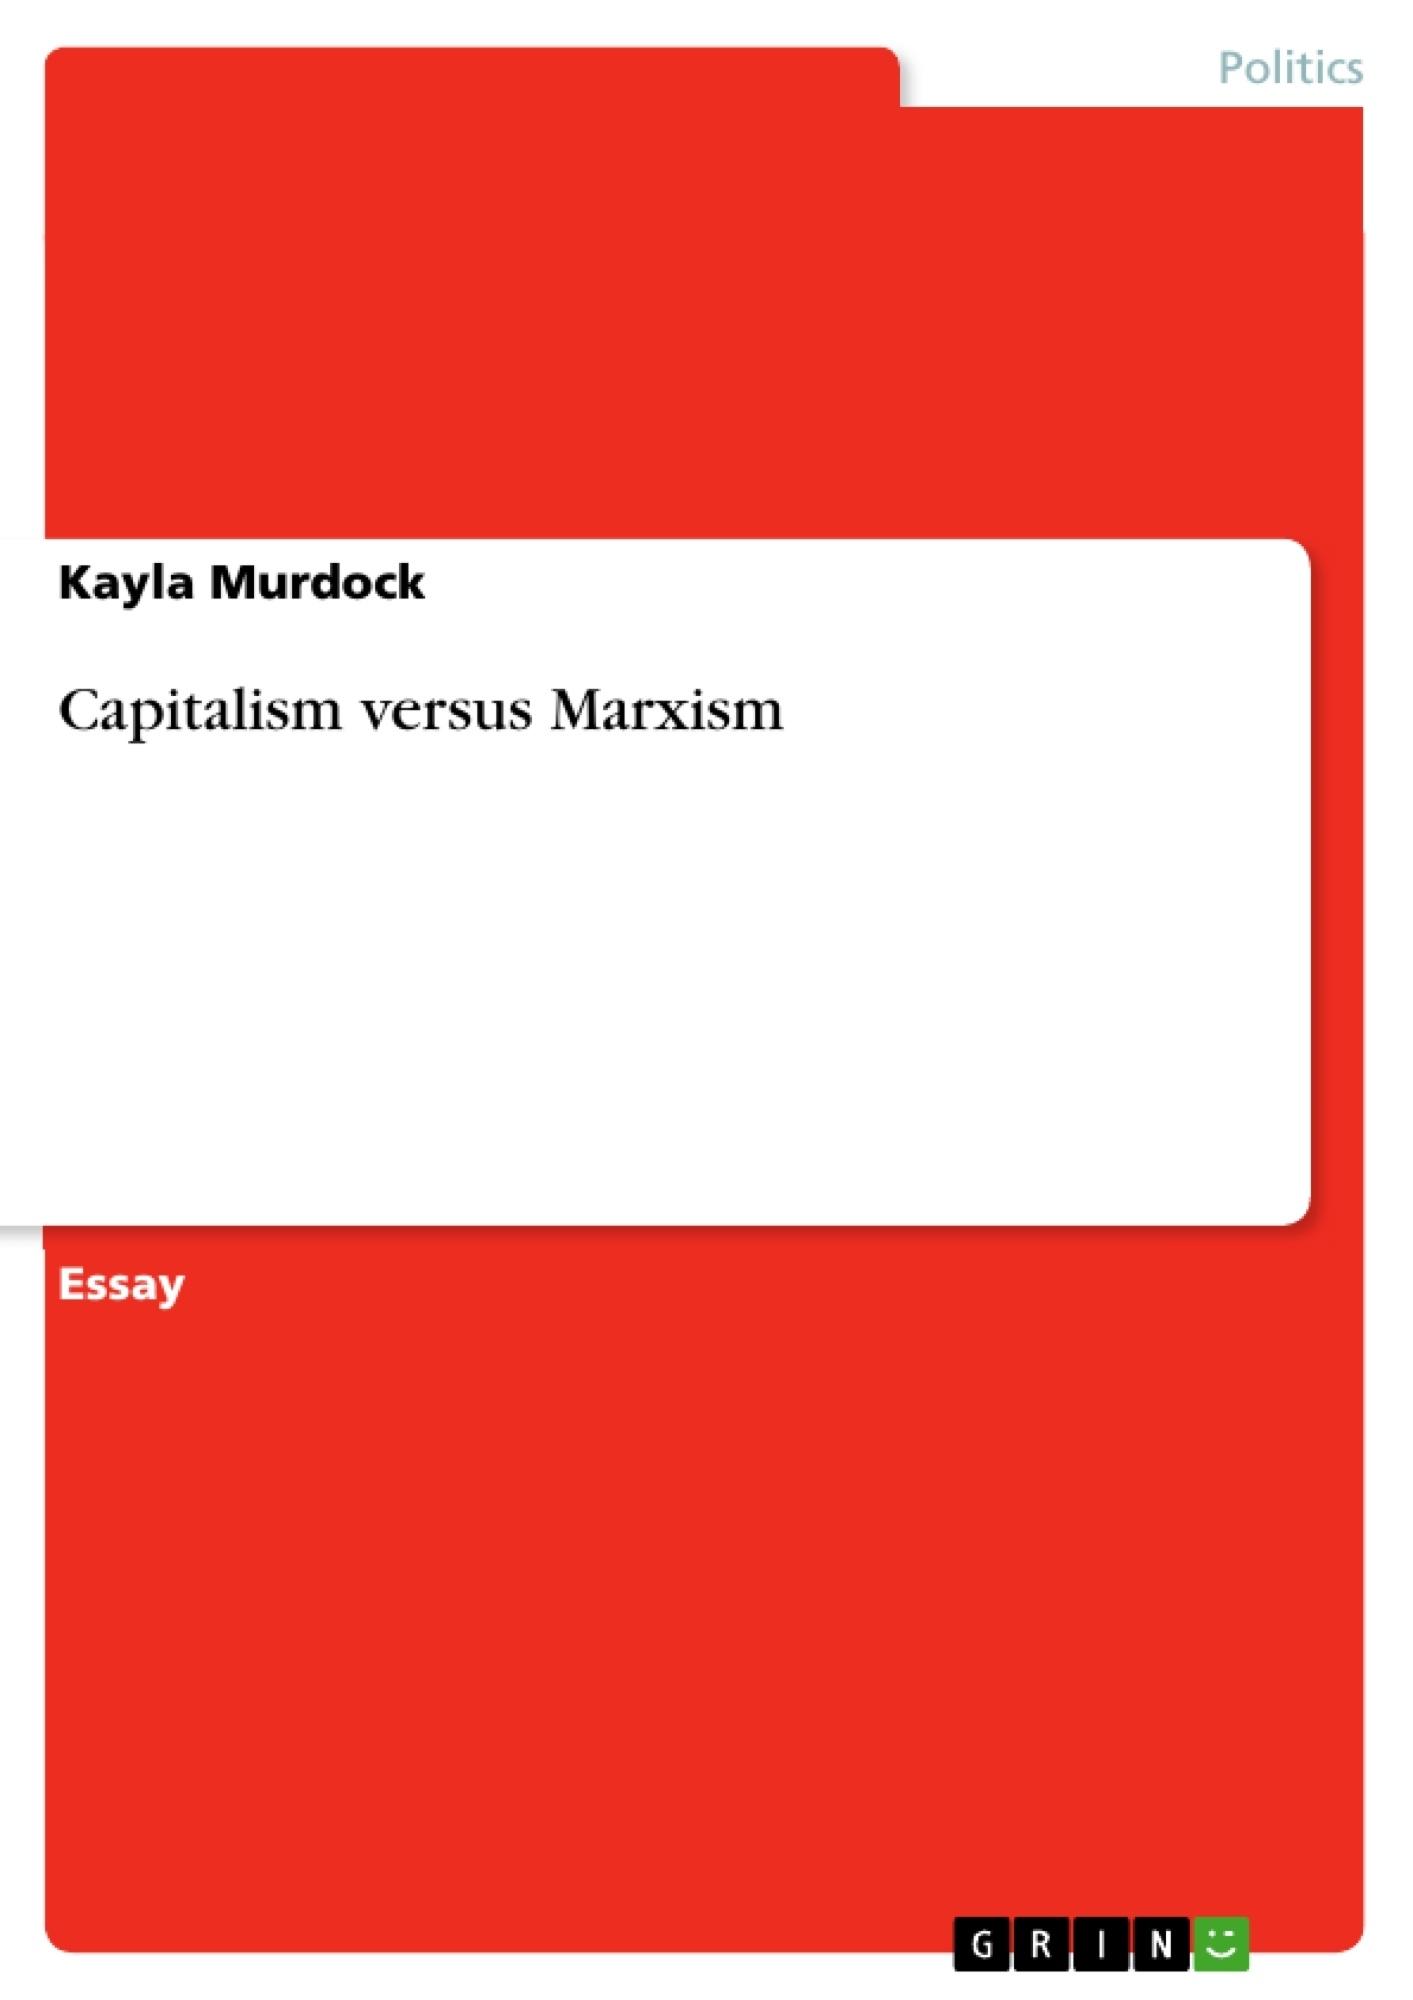 Title: Capitalism versus Marxism